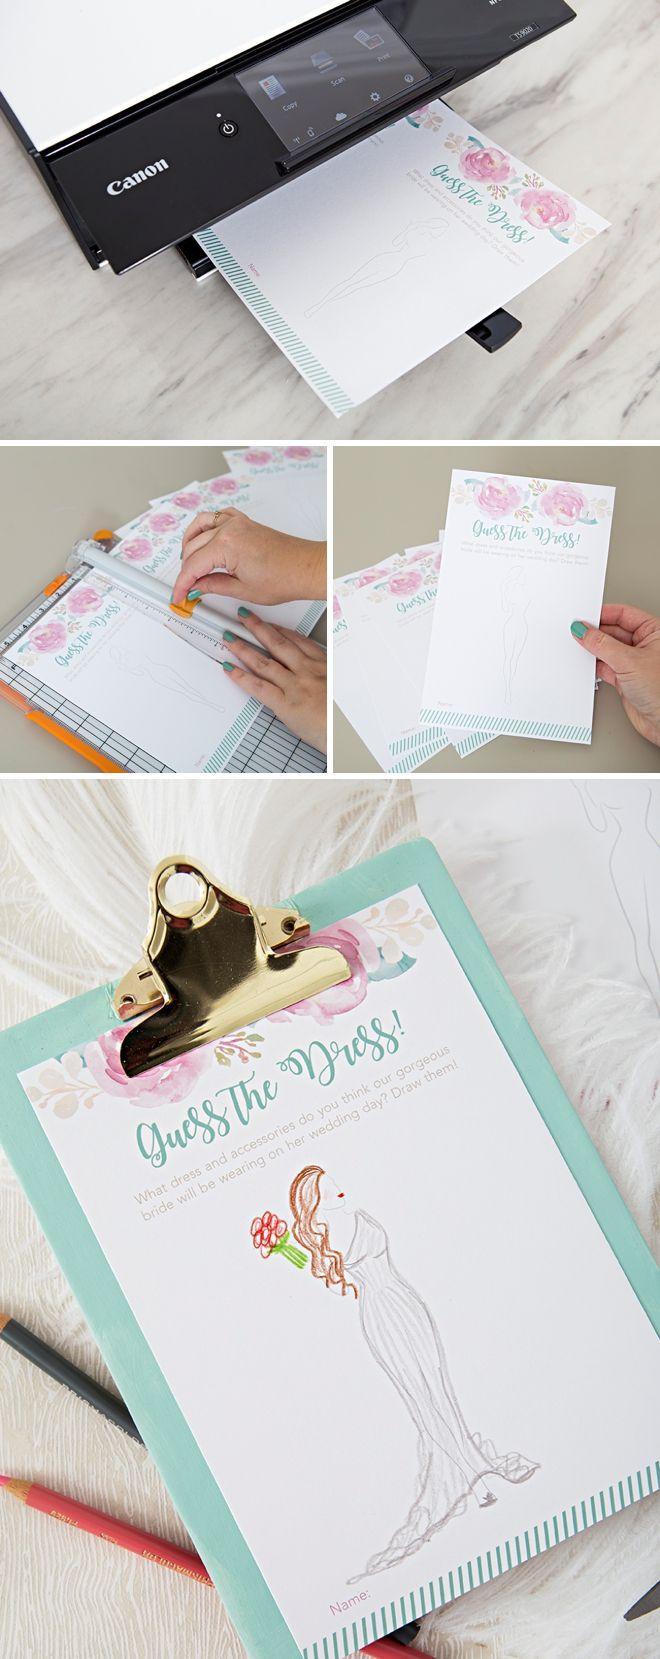 This FREE Printable Guess The Dress Bridal